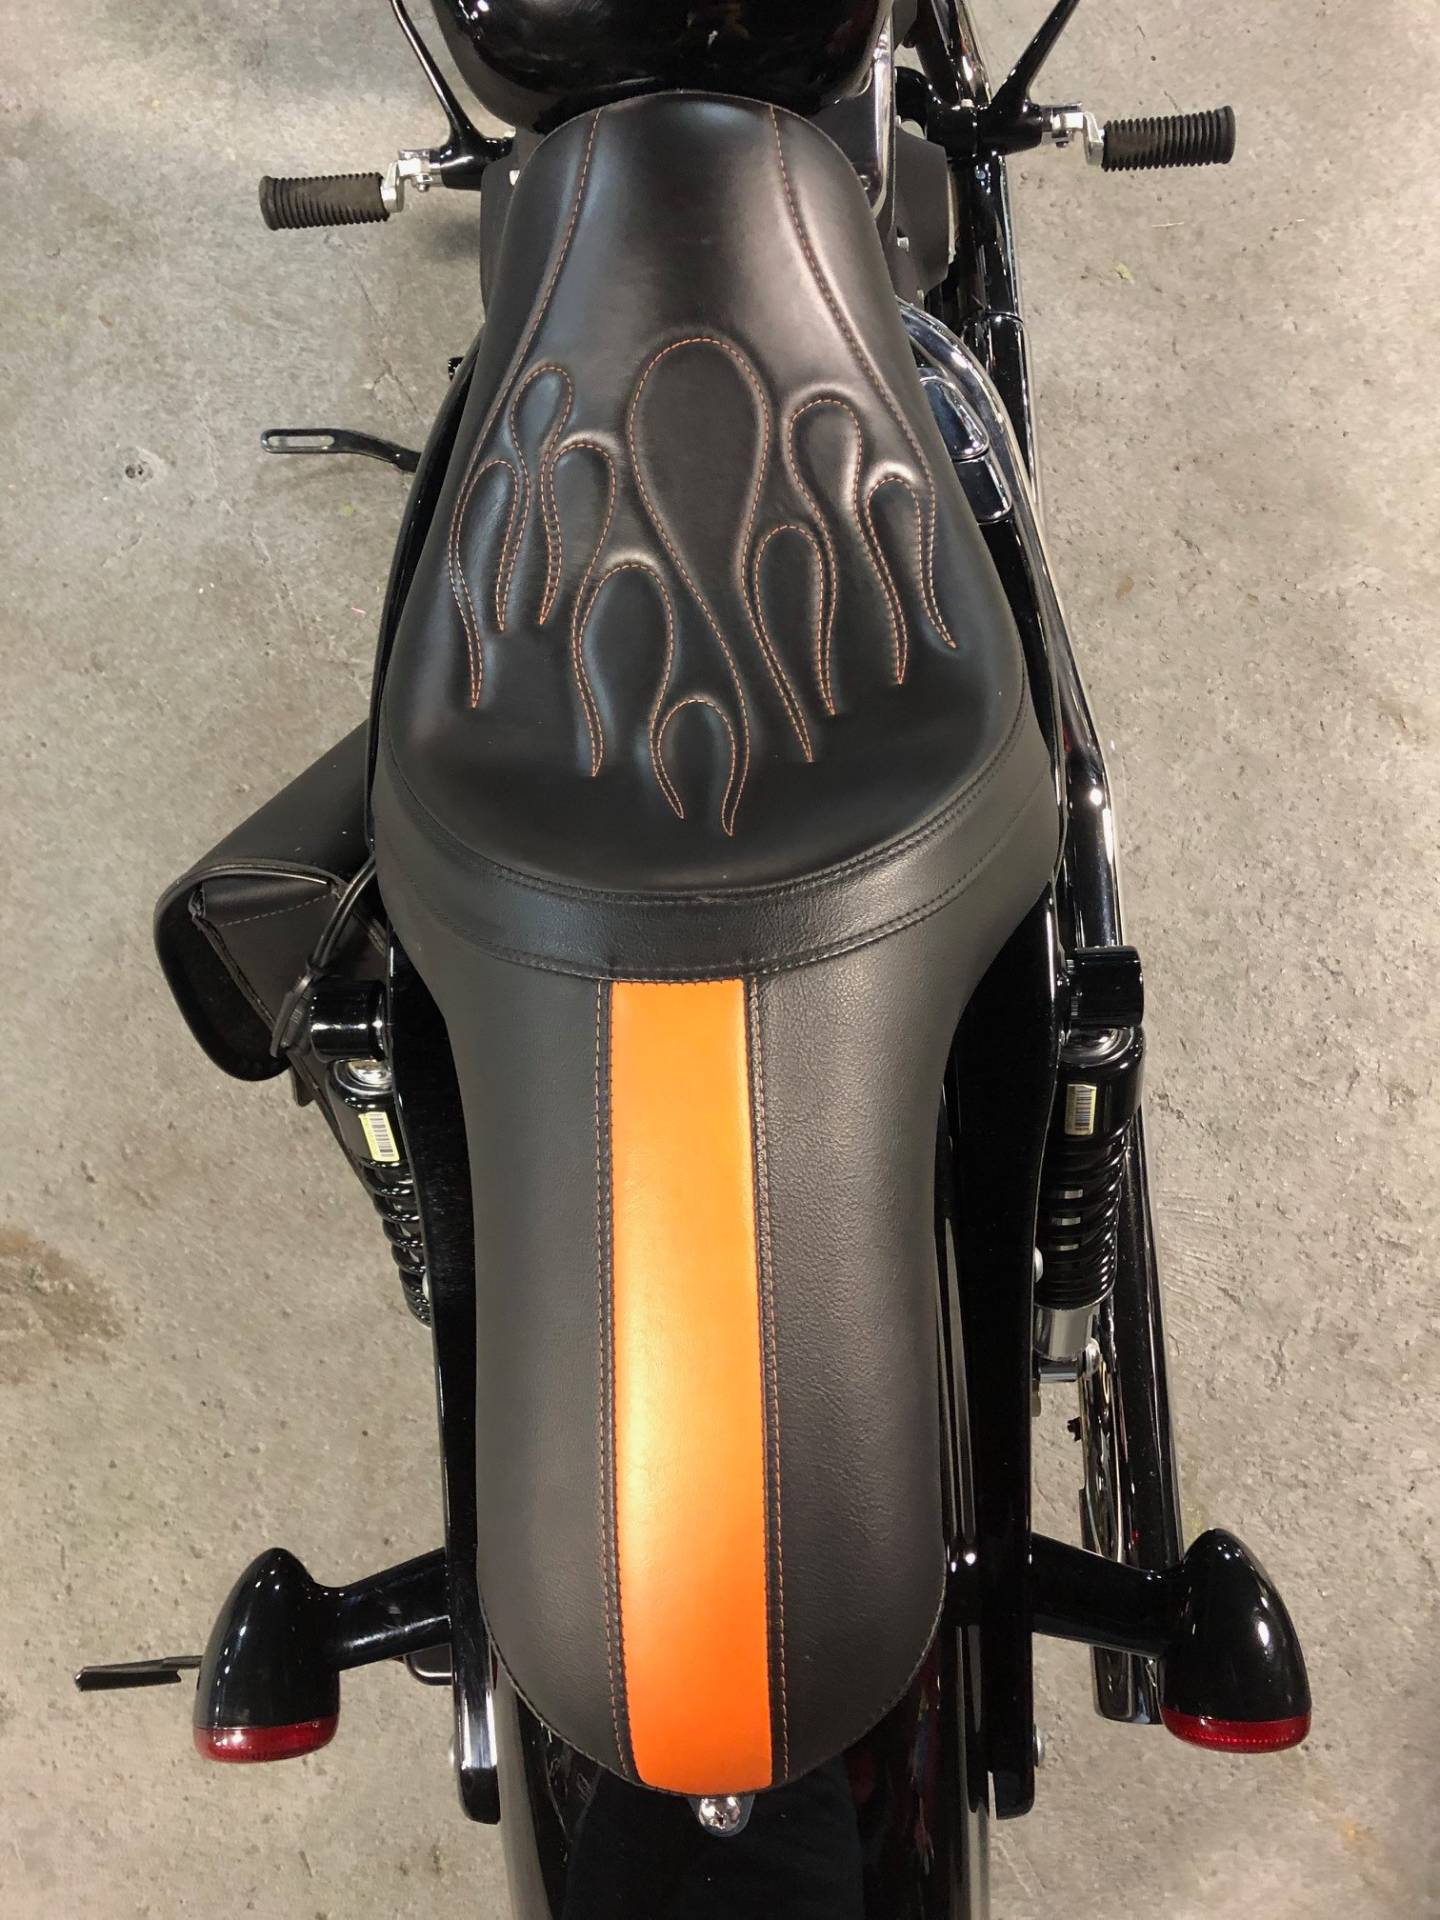 2015 Harley-Davidson Forty-Eight 4